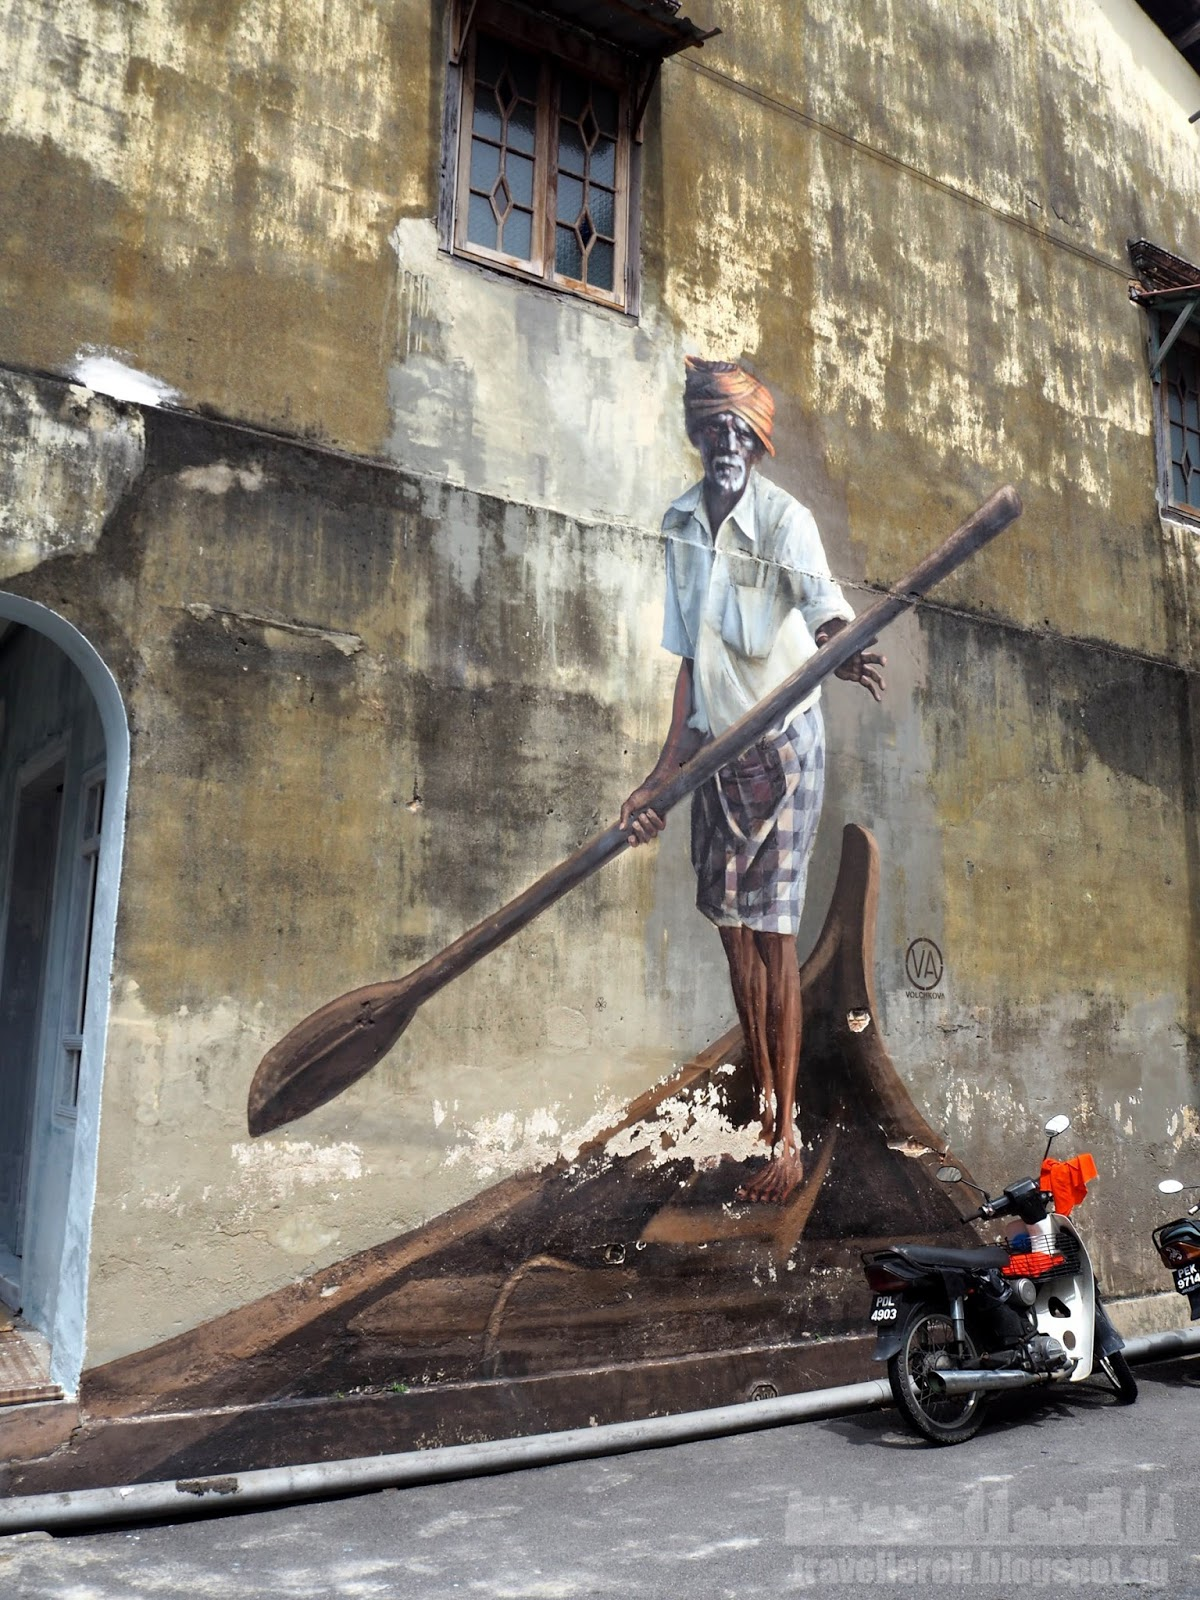 Travellerelf malaysia for Mural 1 malaysia negaraku